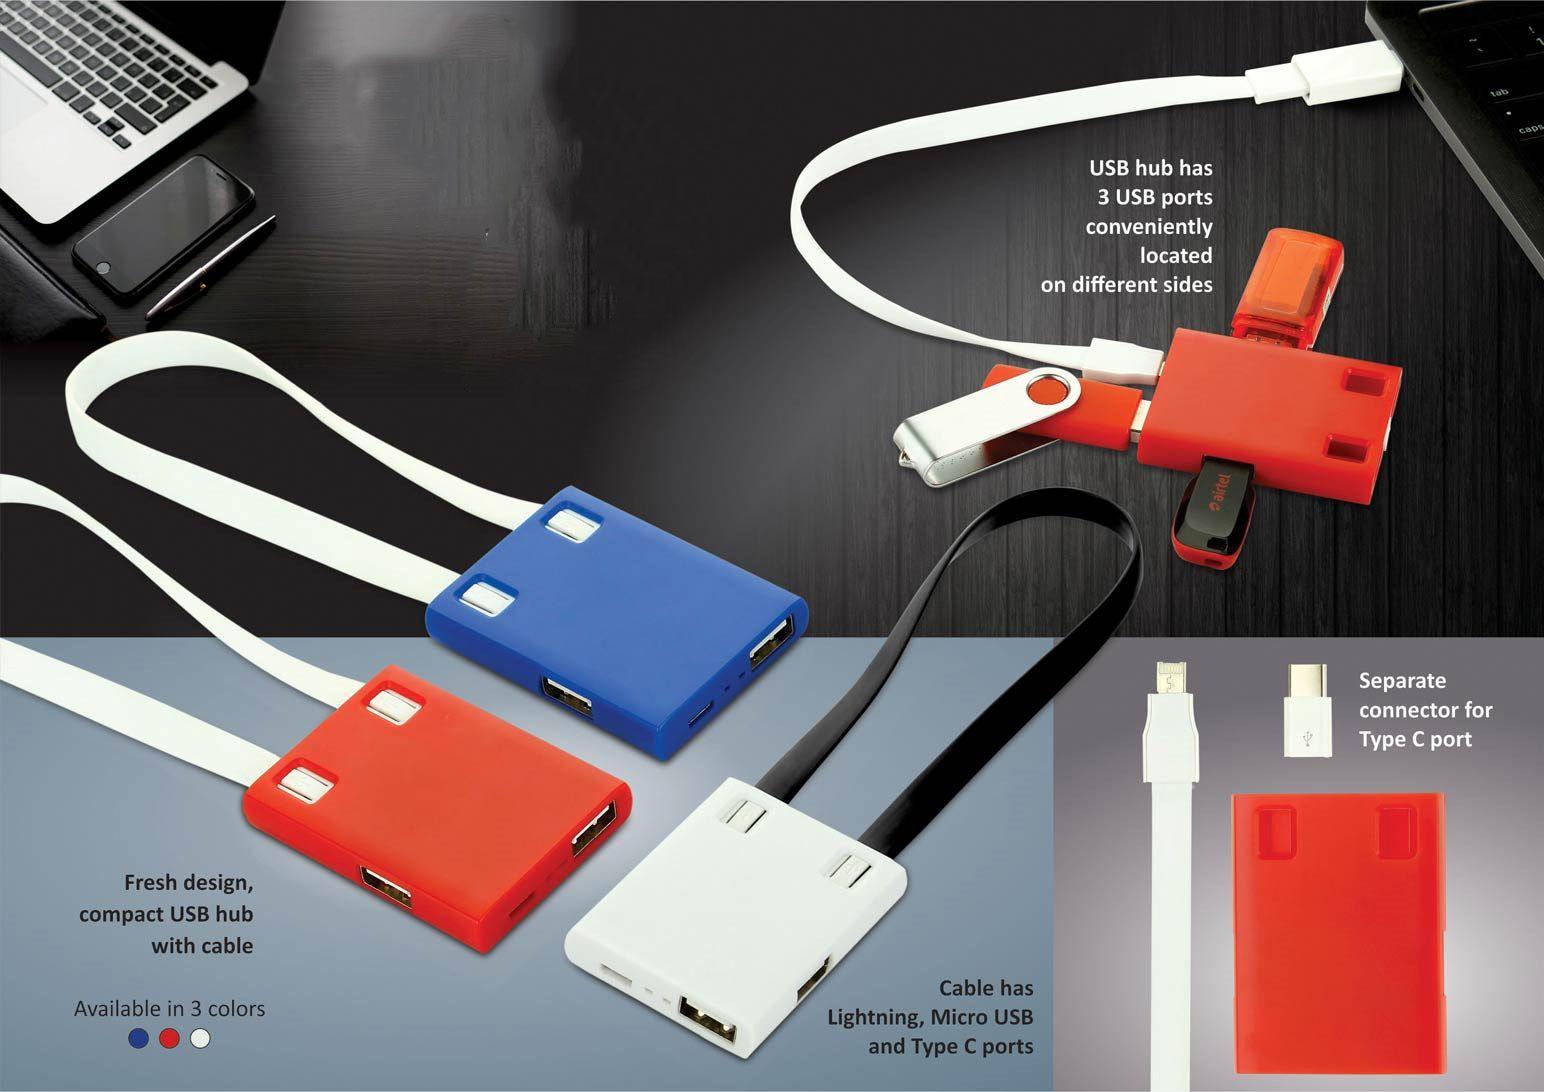 Power Plus Usb Hub With Detachable Cable (Ios, Micro, Type C) | 3 Usb Ports C101